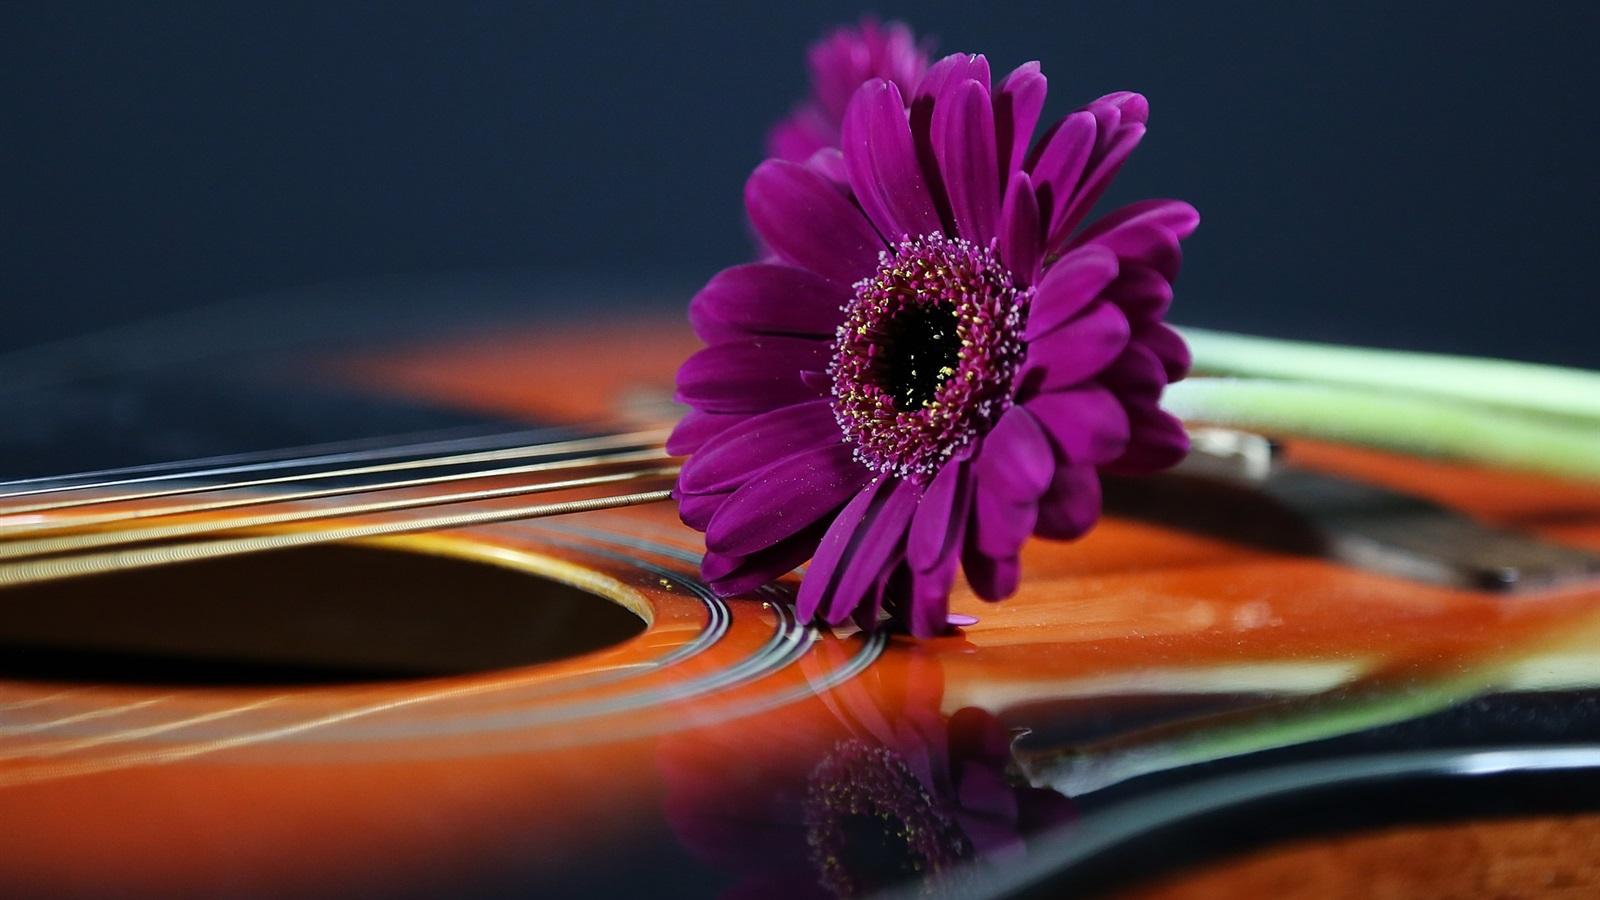 Wallpaper Purple daisy, guitar 1920x1200 HD Picture, Image